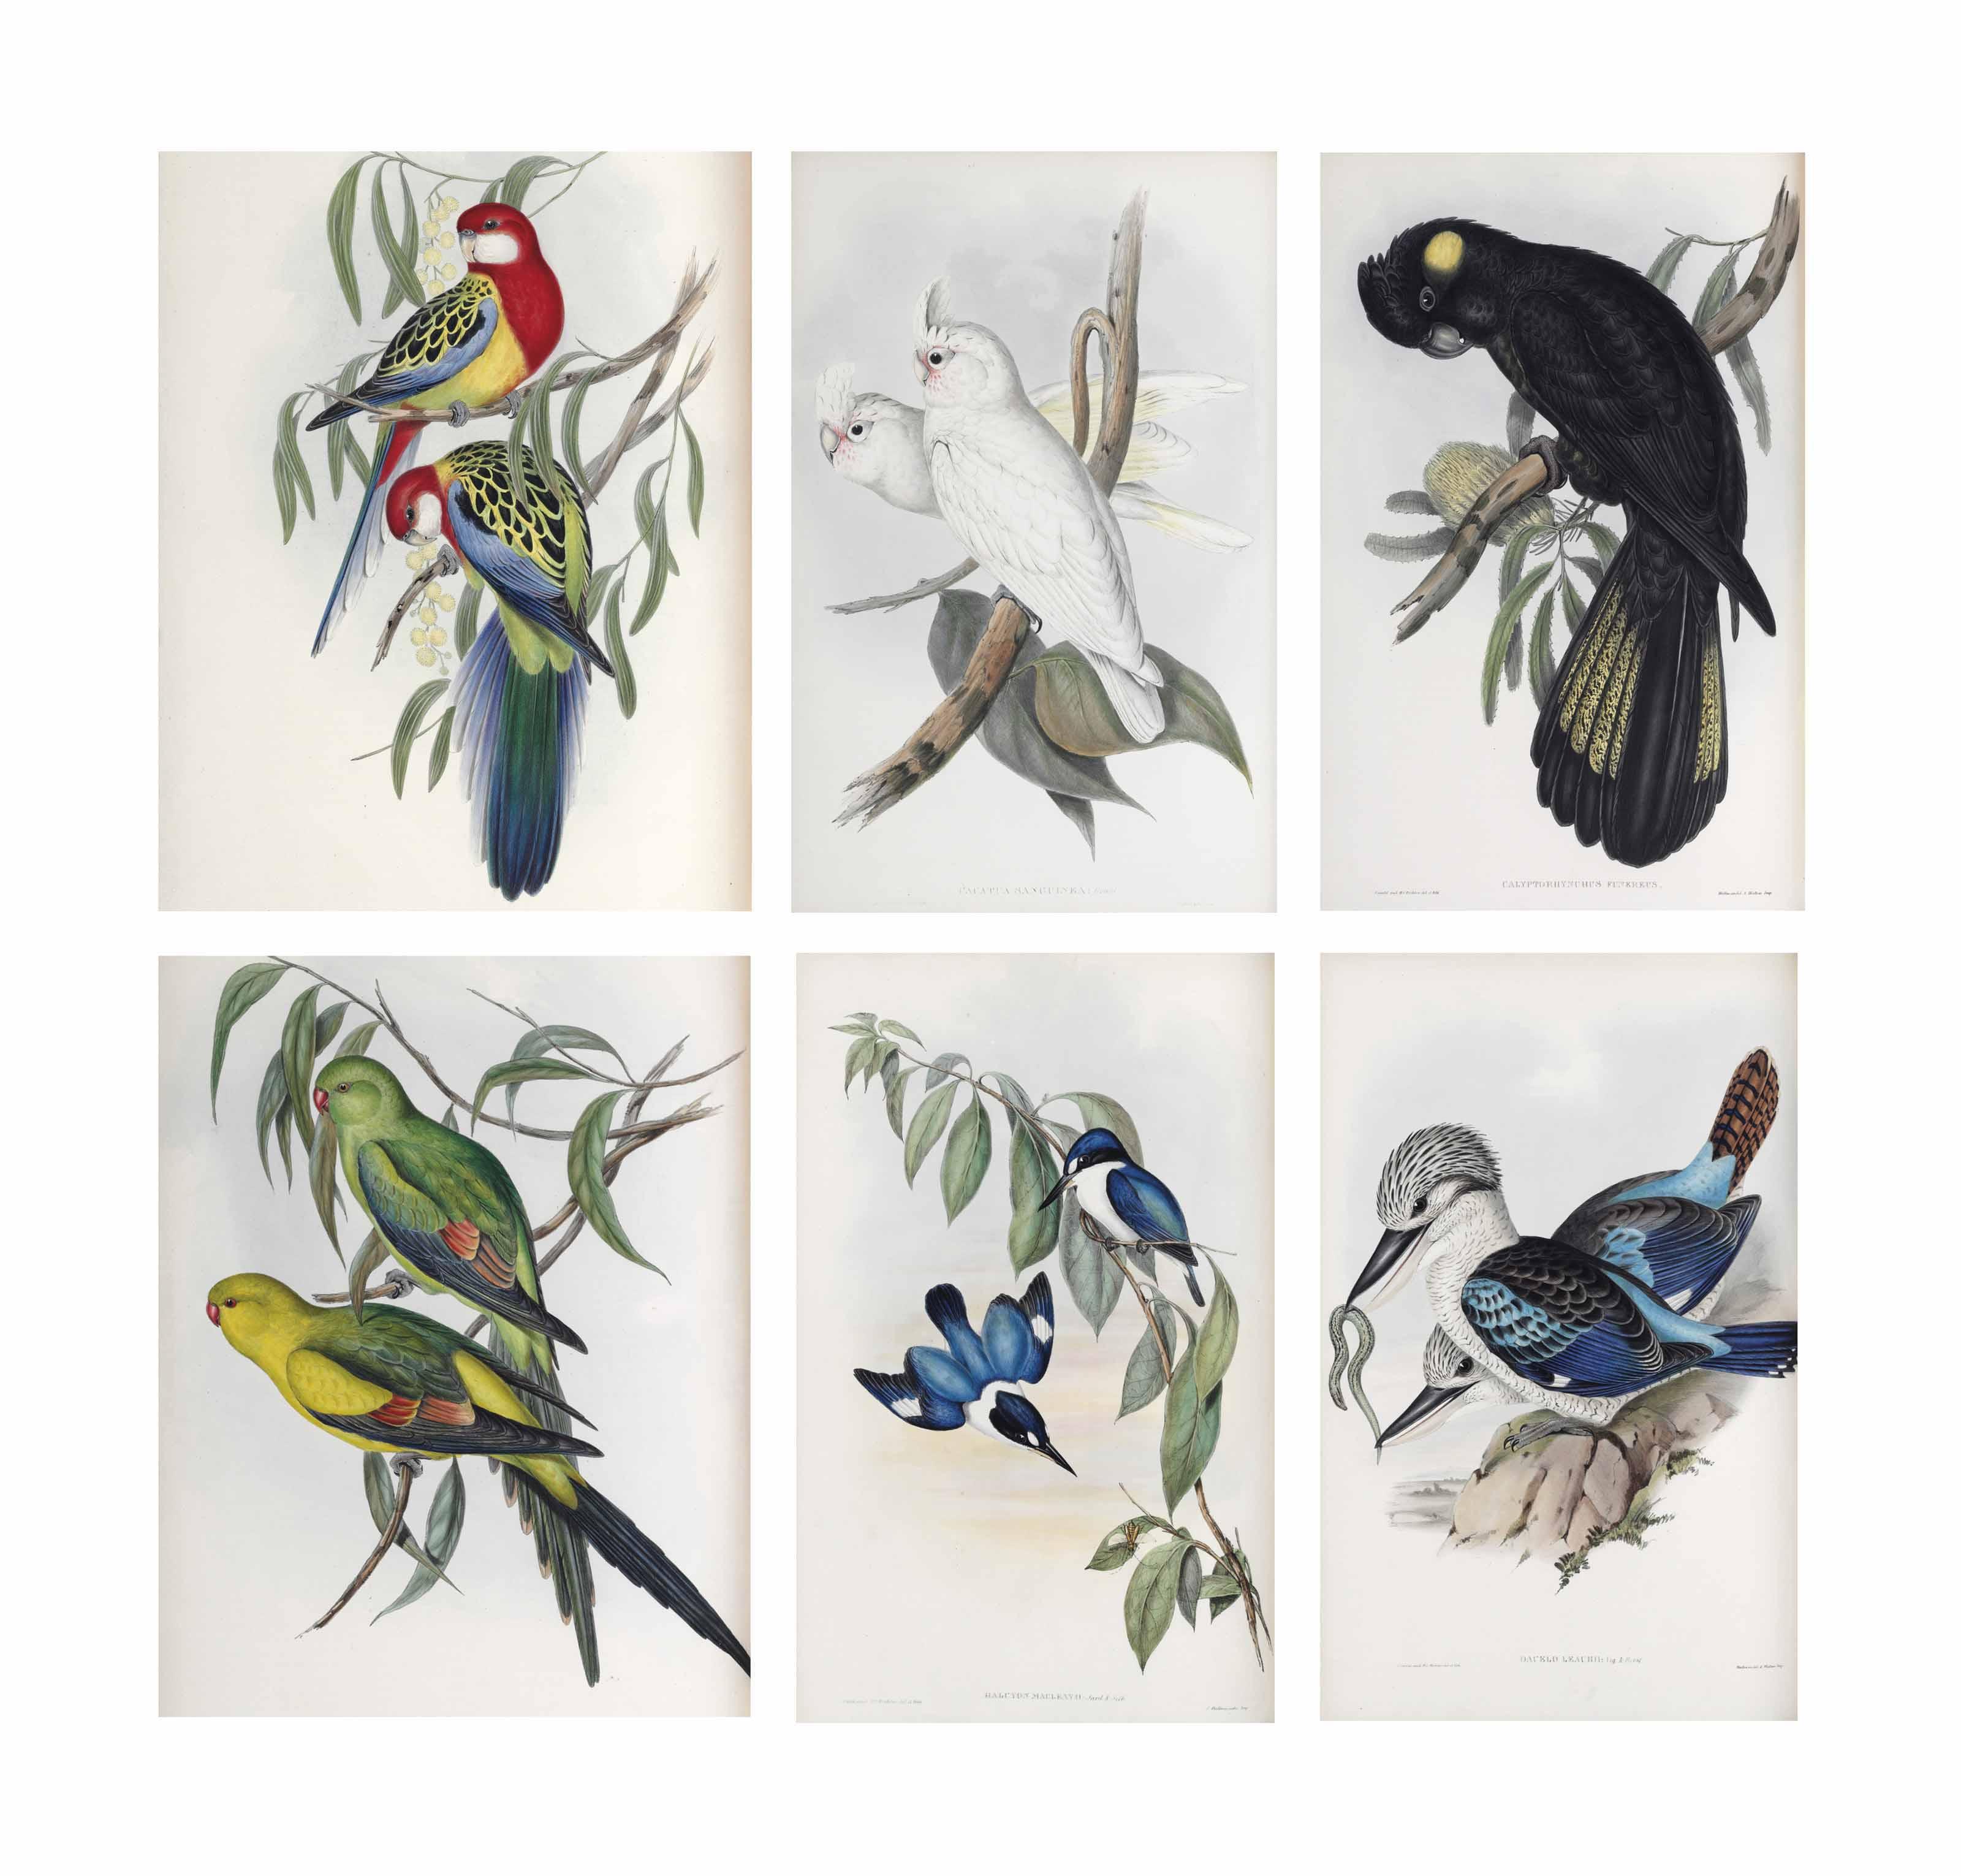 GOULD, John (1804-1881). The Birds of Australia. London: Richard and John E. Taylor for the author, [1840]-1848--Supplement. London: Taylor and Francis for the author, [1851]-1869.